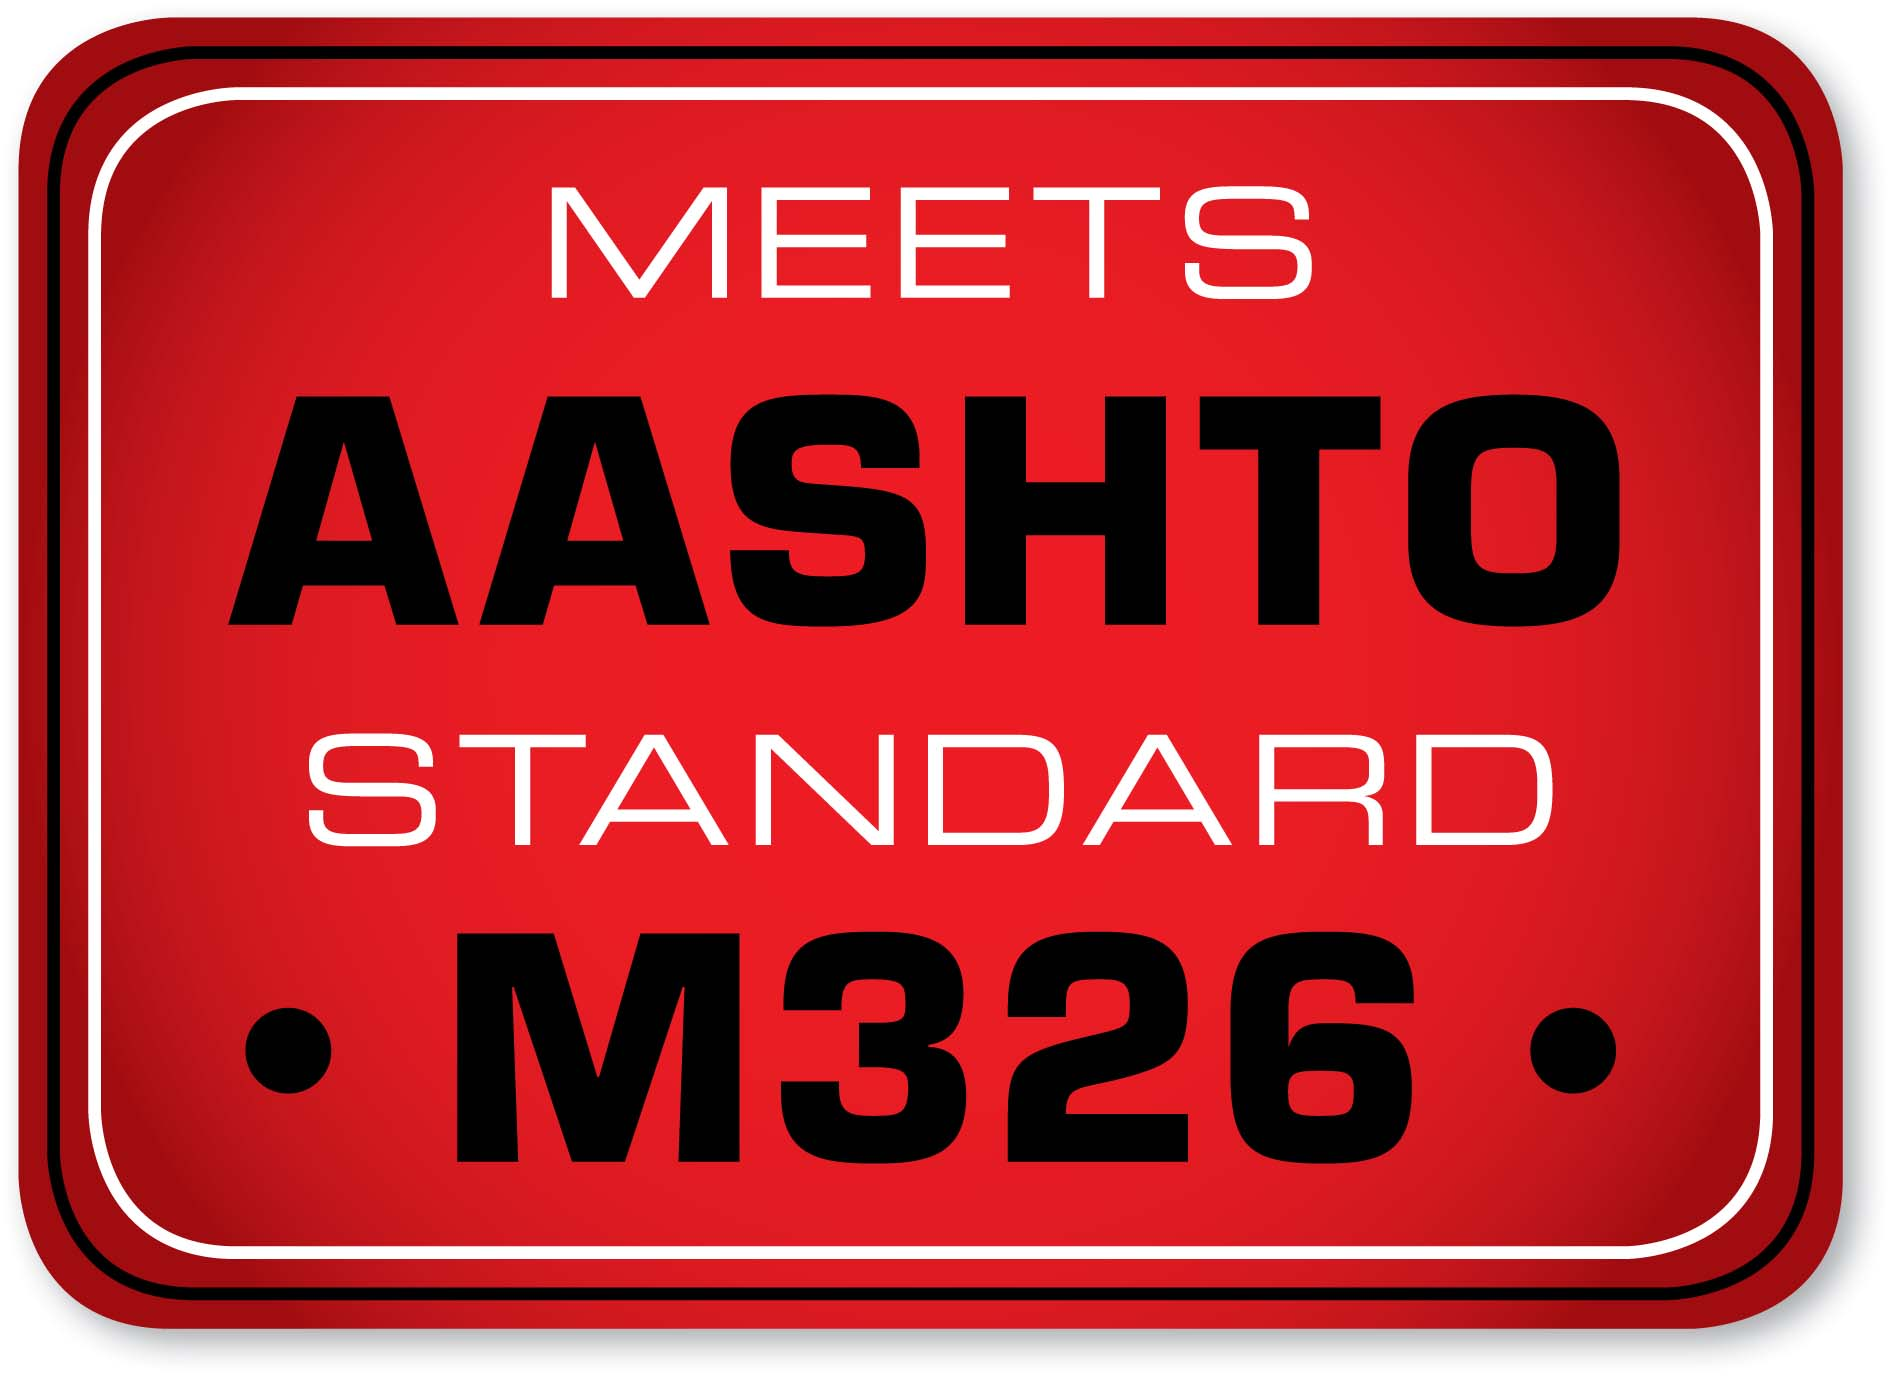 Meets AASHTO Compliance